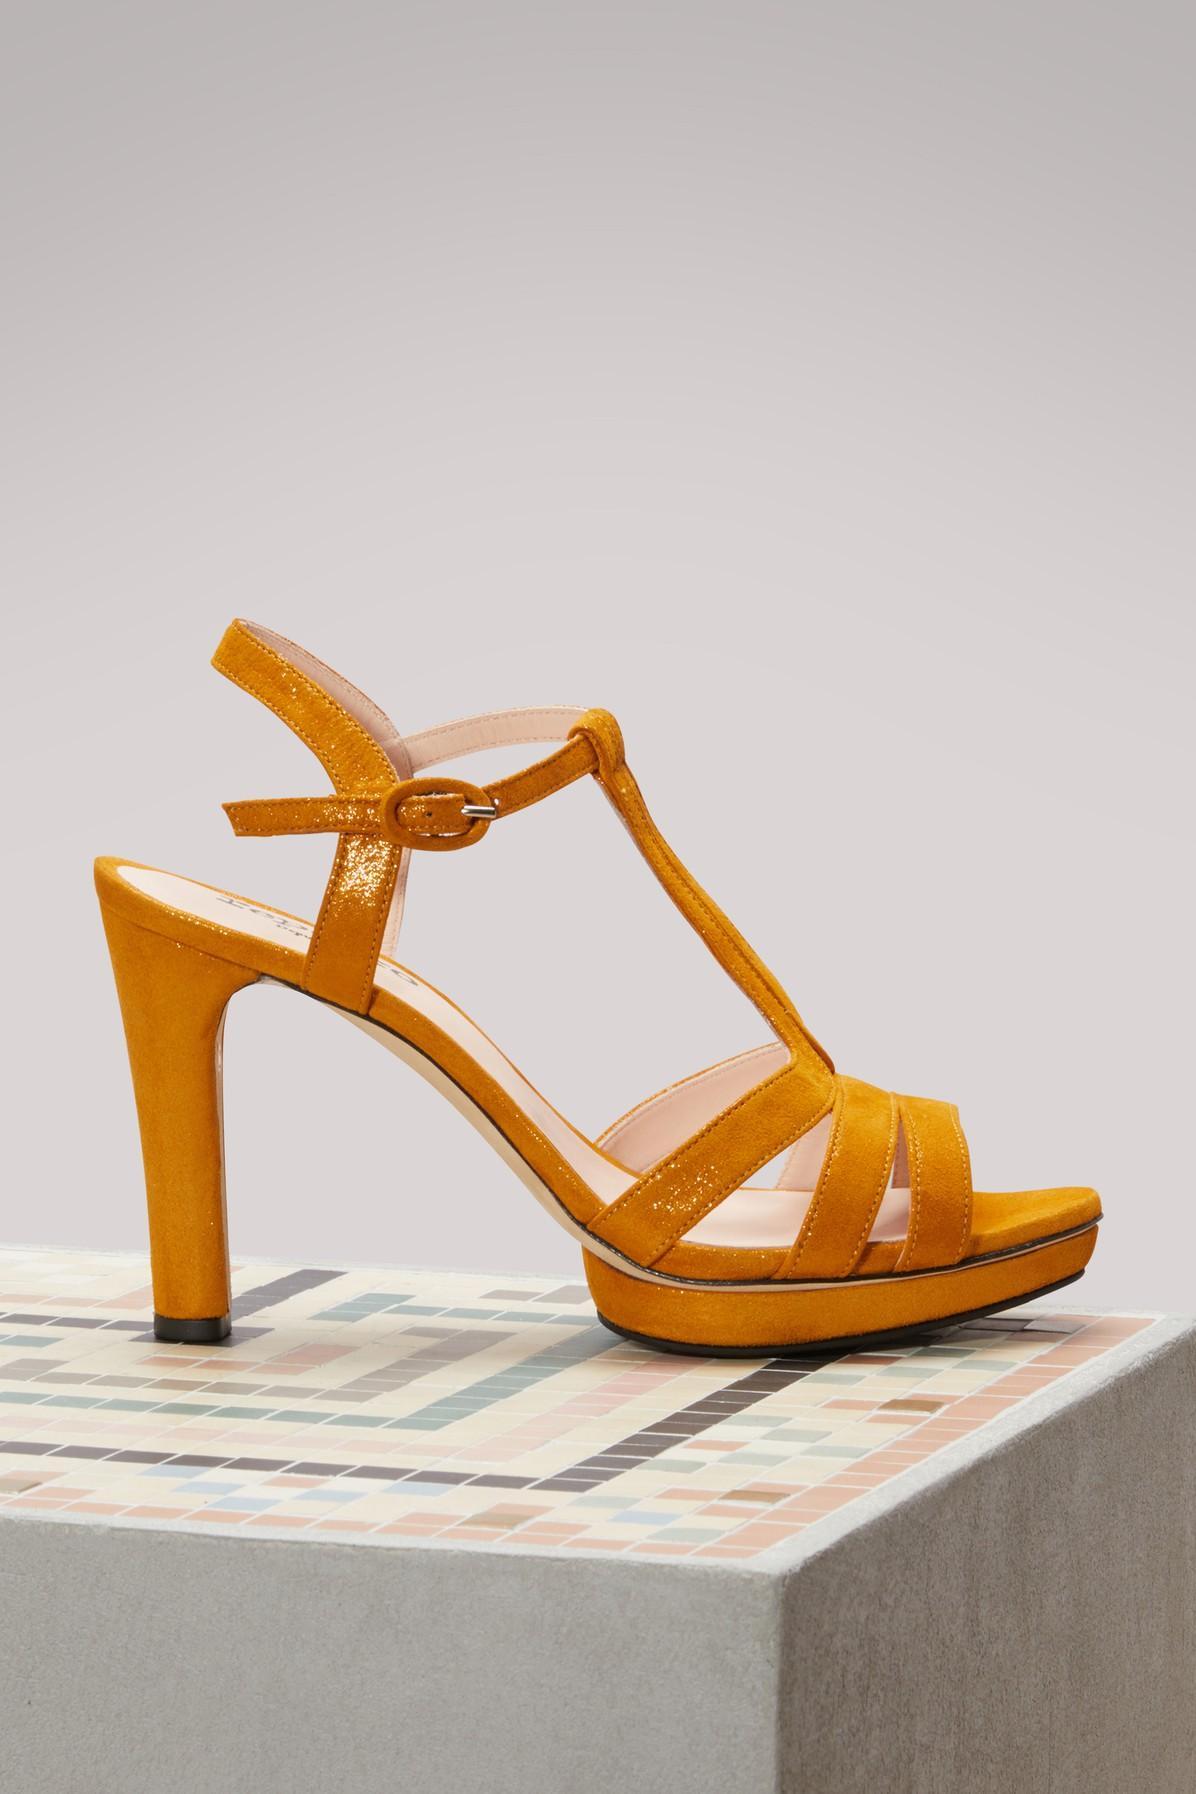 Repetto Bikini Sandals With Heels In Pigment